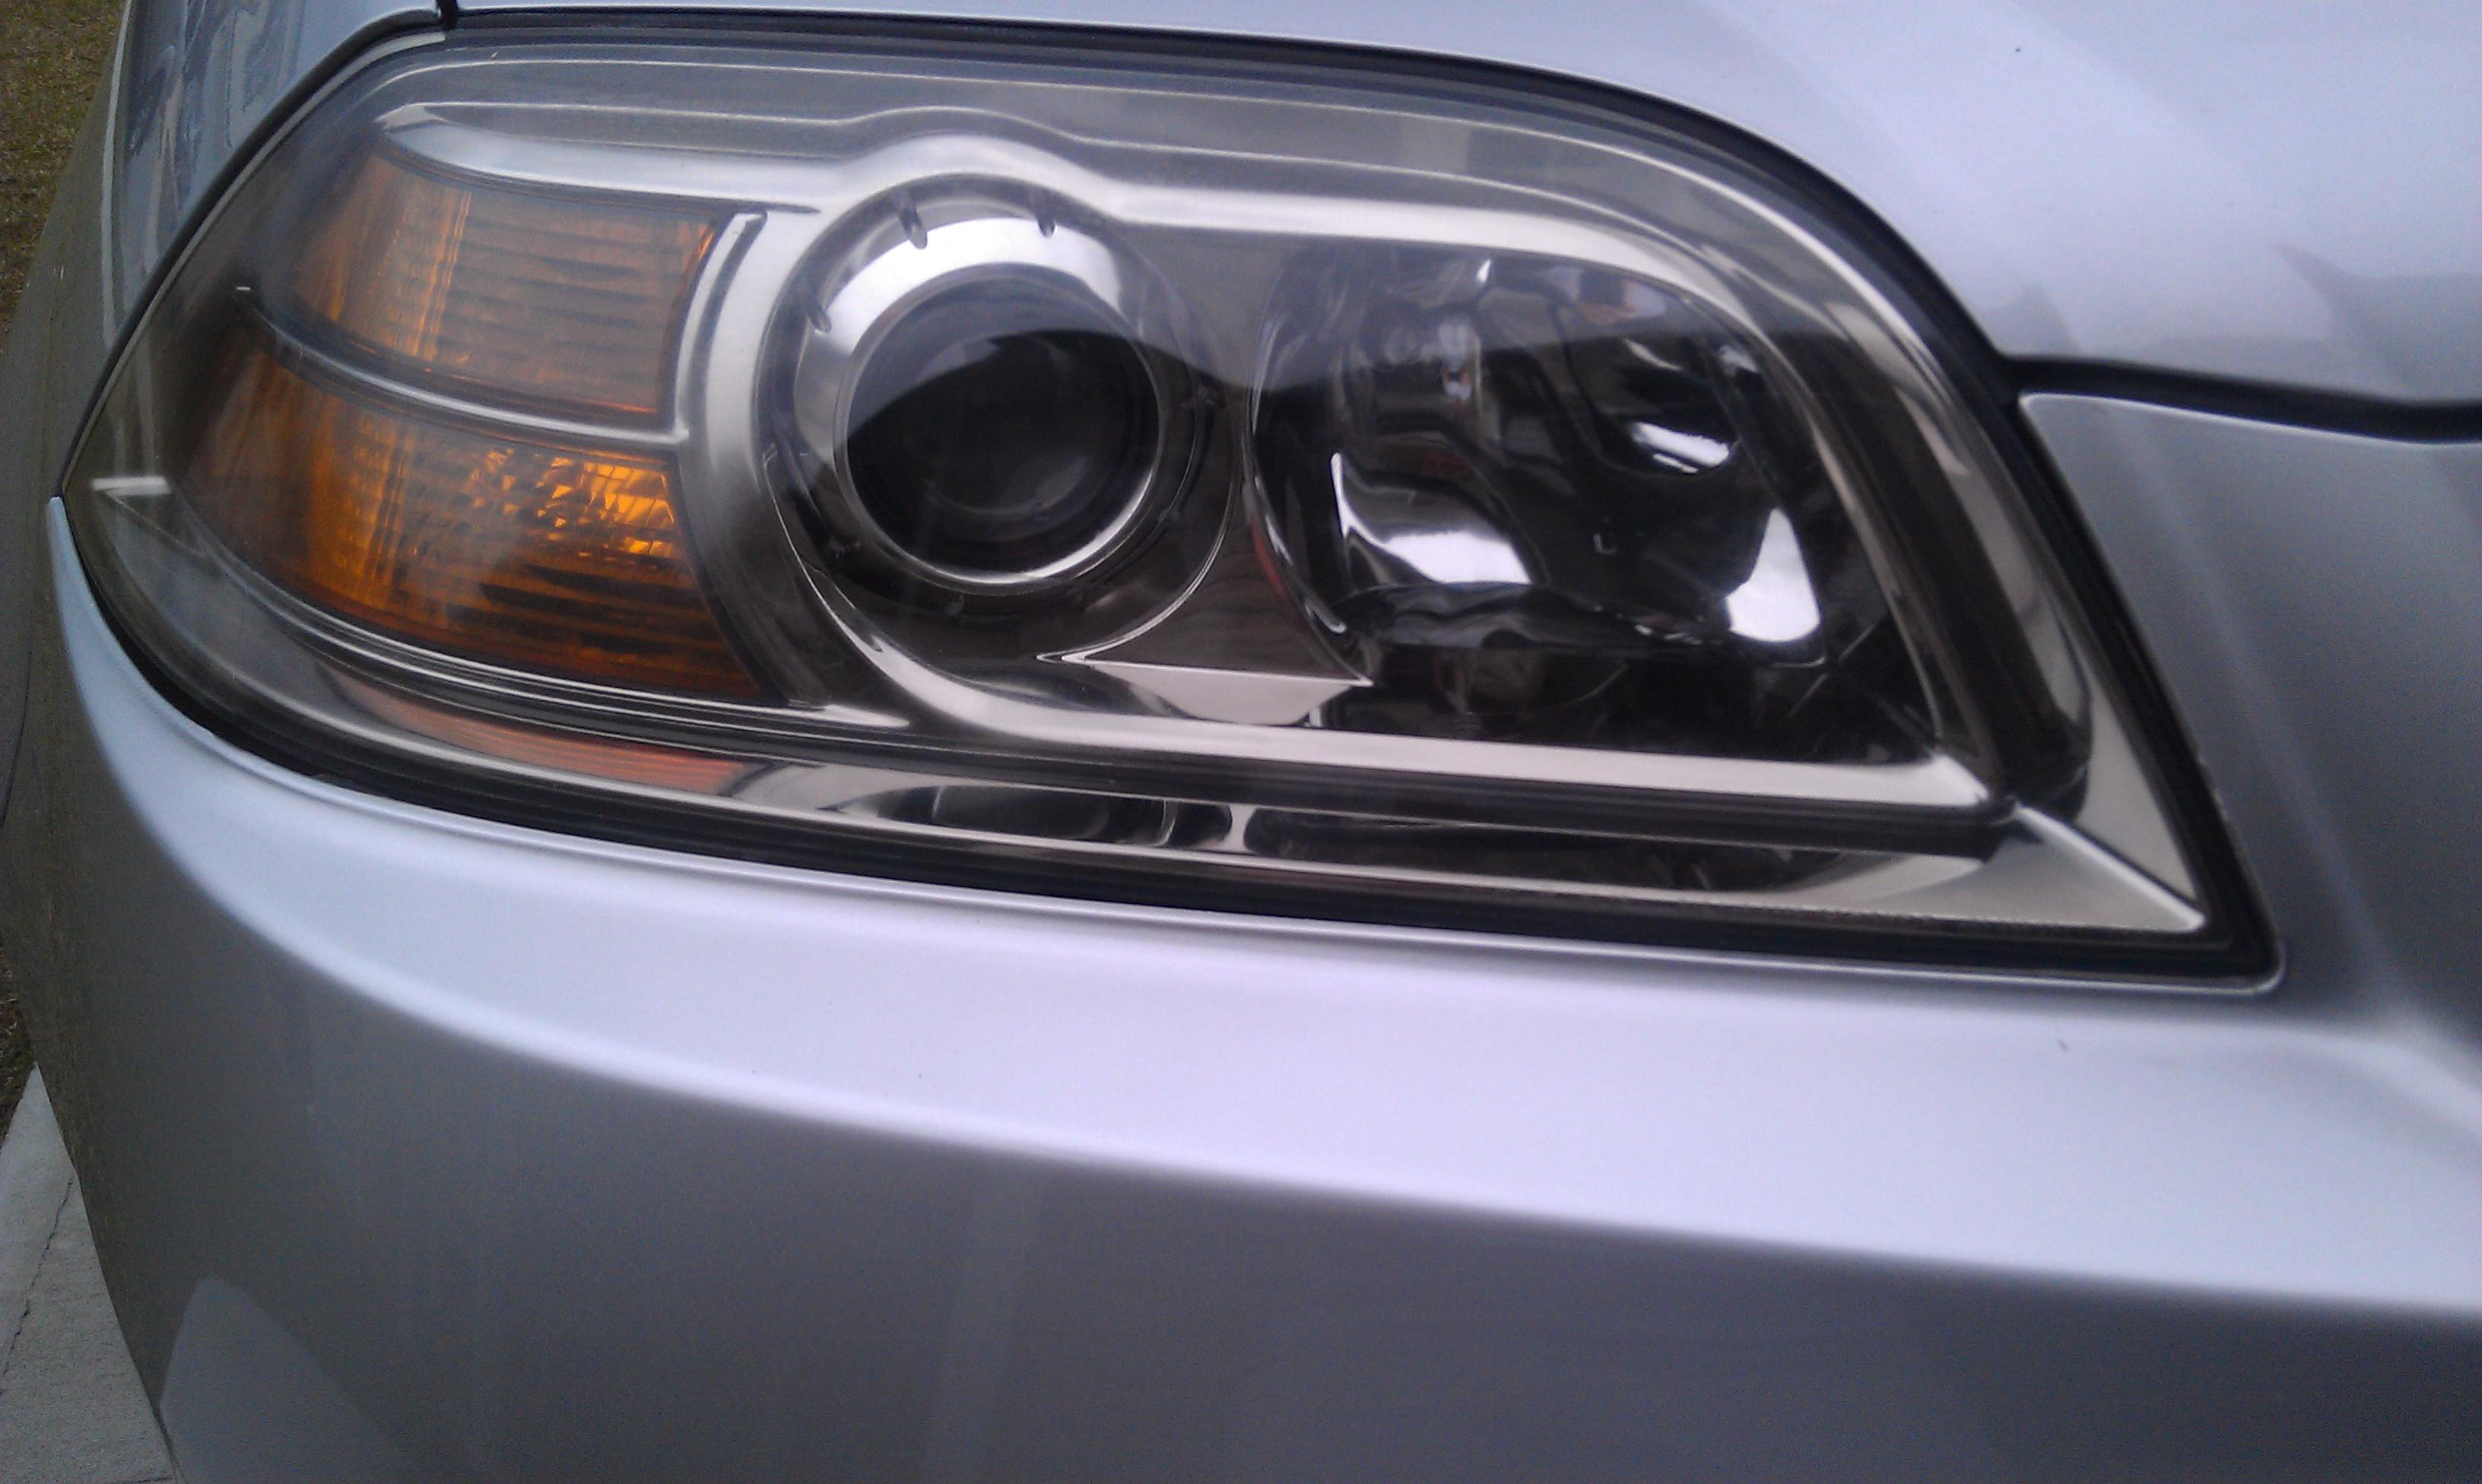 Acura Mdx Headlight Diagram Product Wiring Diagrams - 2004 acura mdx headlights